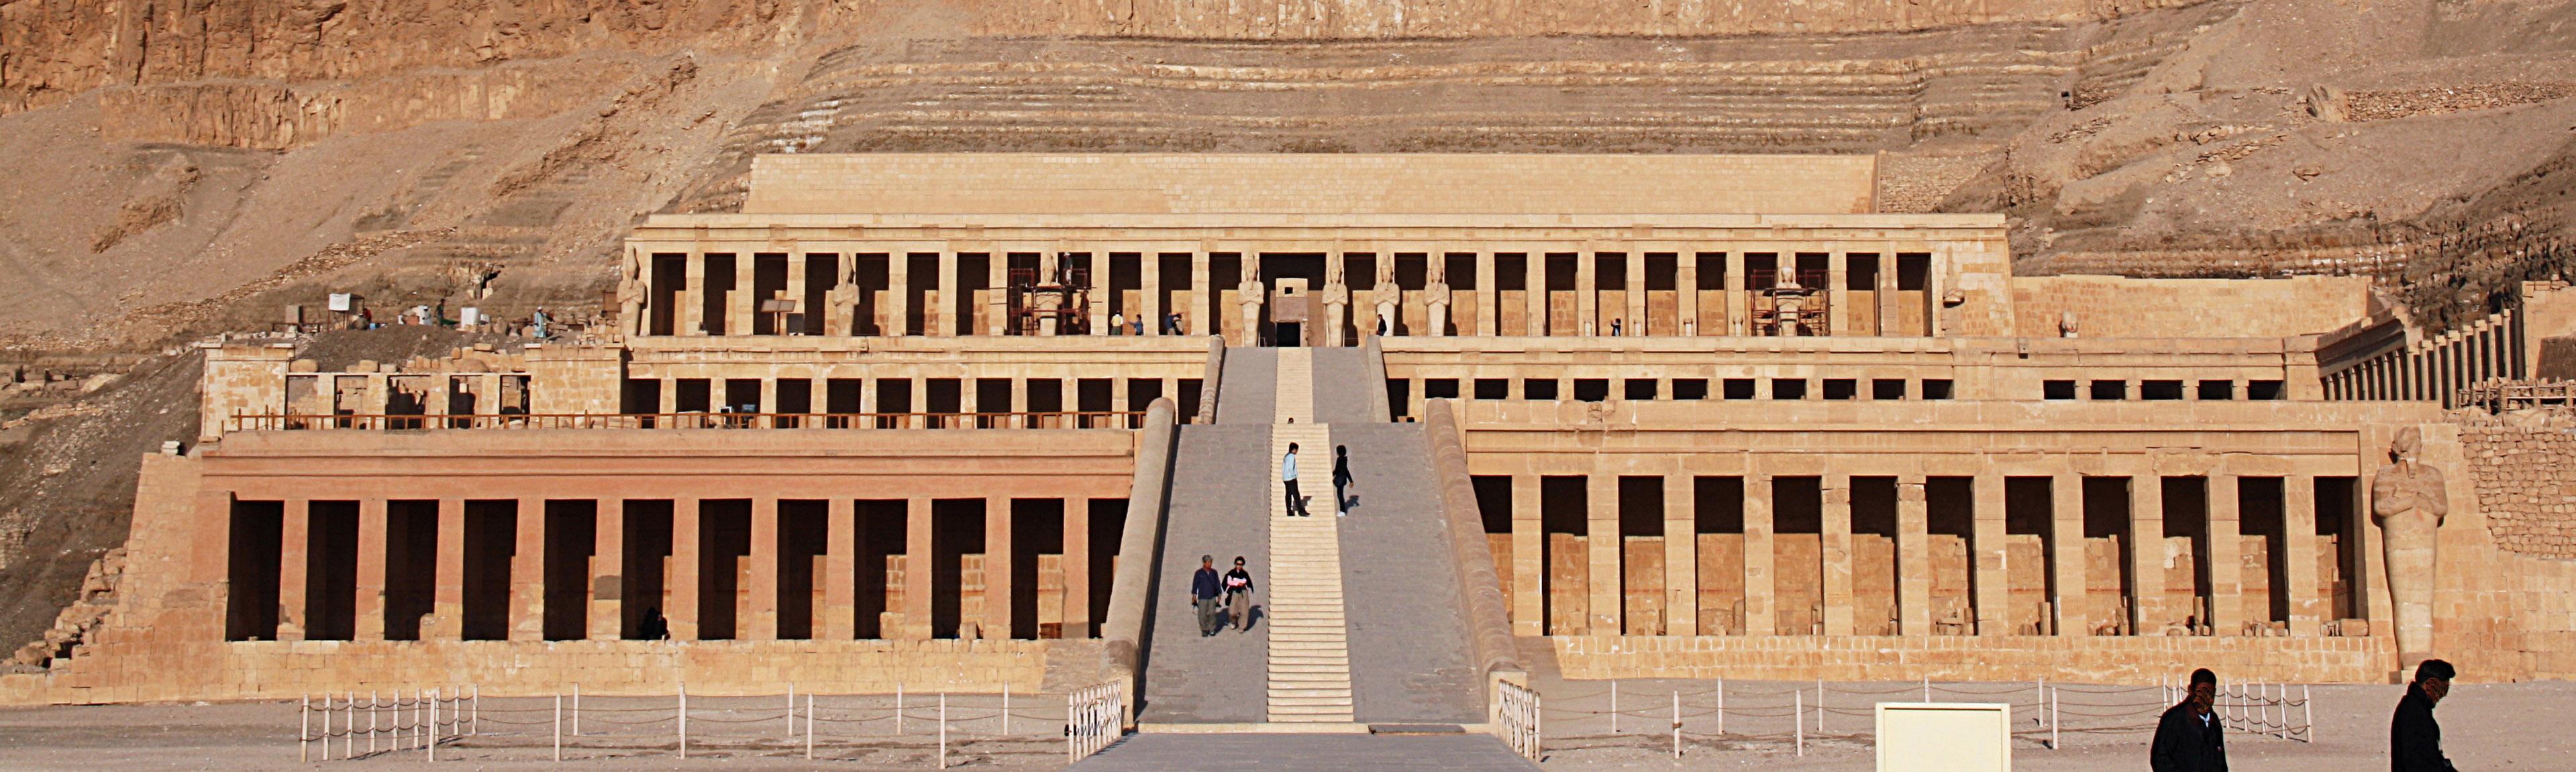 Deir el-Bahari Temples and Tombs - West Bank Of The Nile Luxor, EgyptDeir el-Bahari Temples and Tombs - West Bank Of The Nile Luxor, Egypt